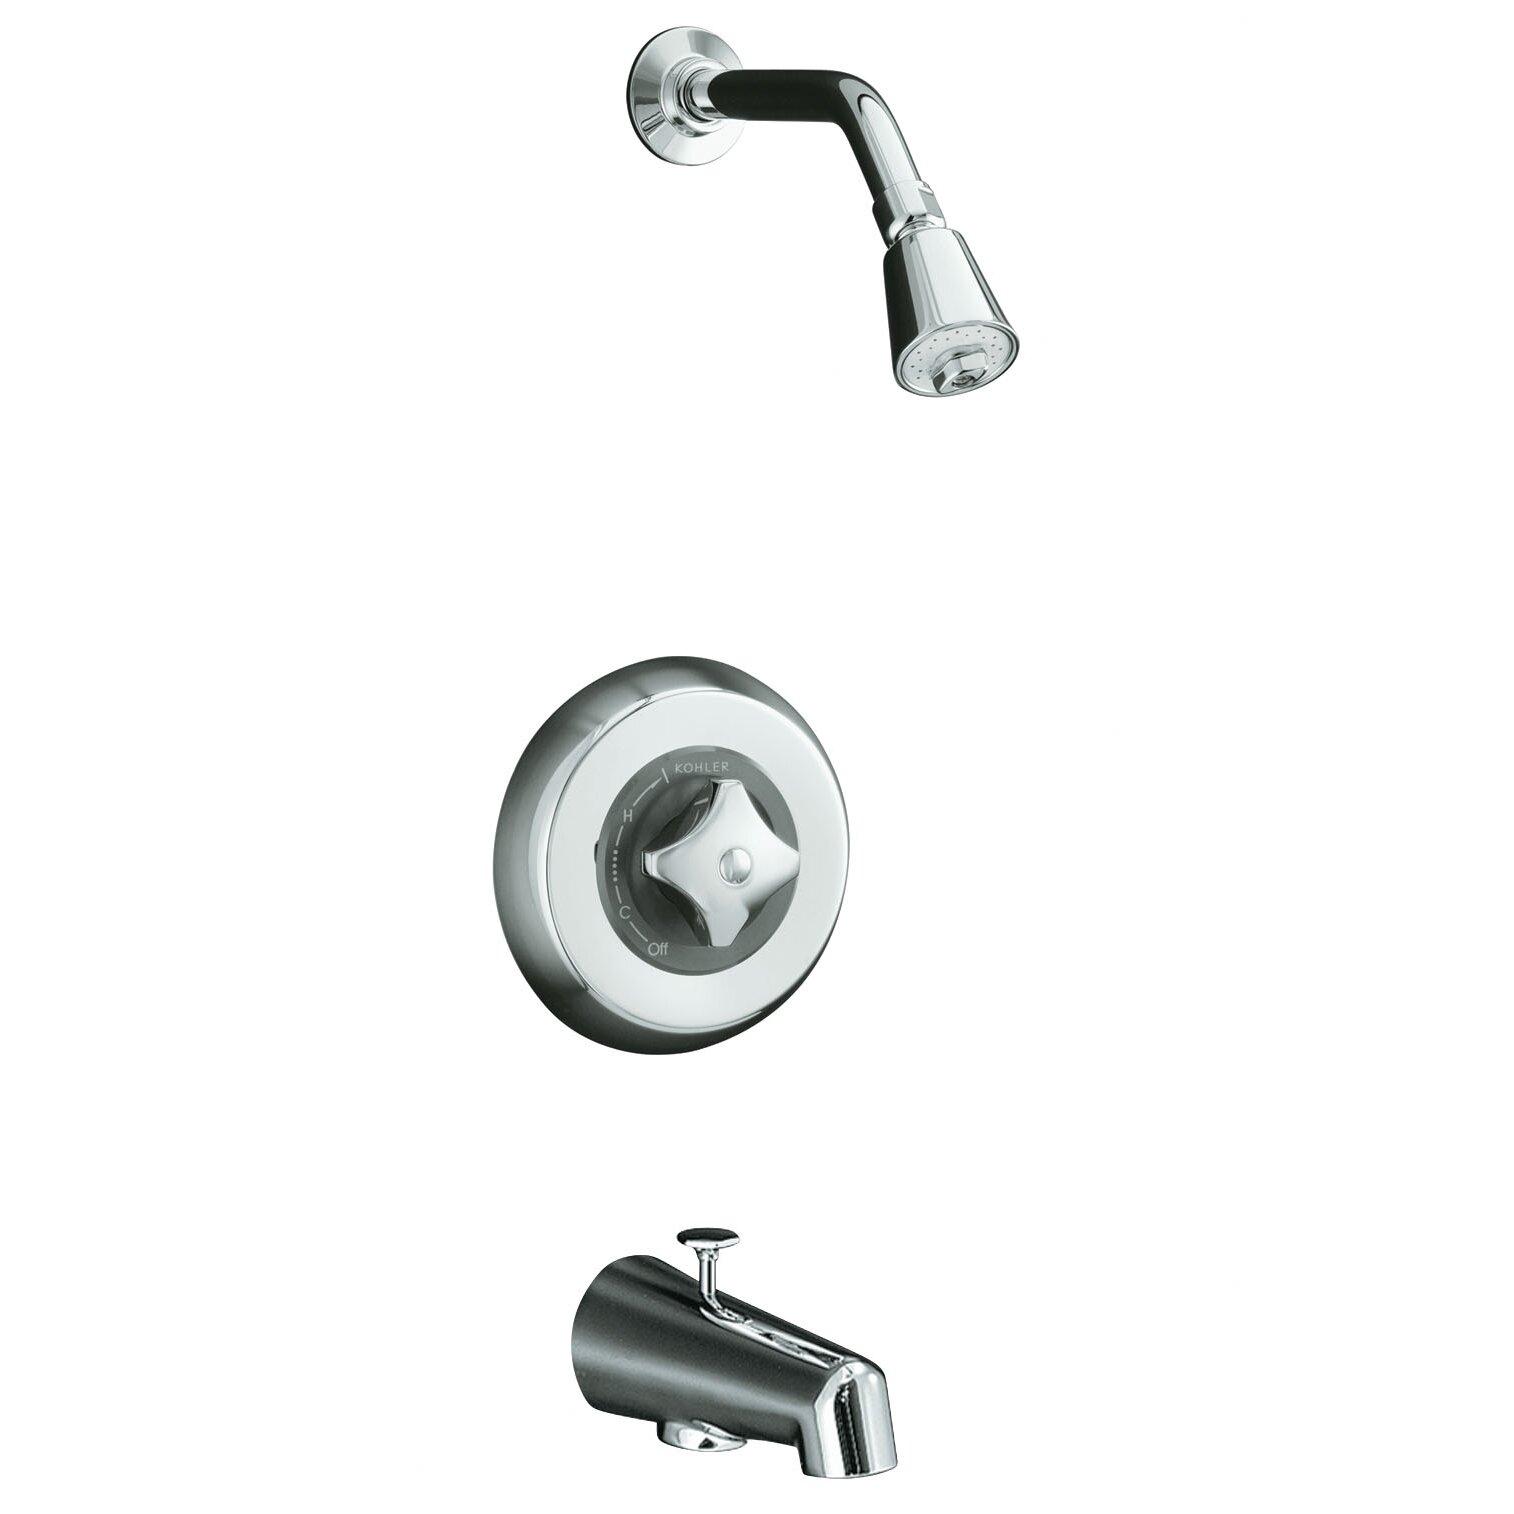 Kohler Triton Bath/Shower Trim Set with Shower Head, Arm